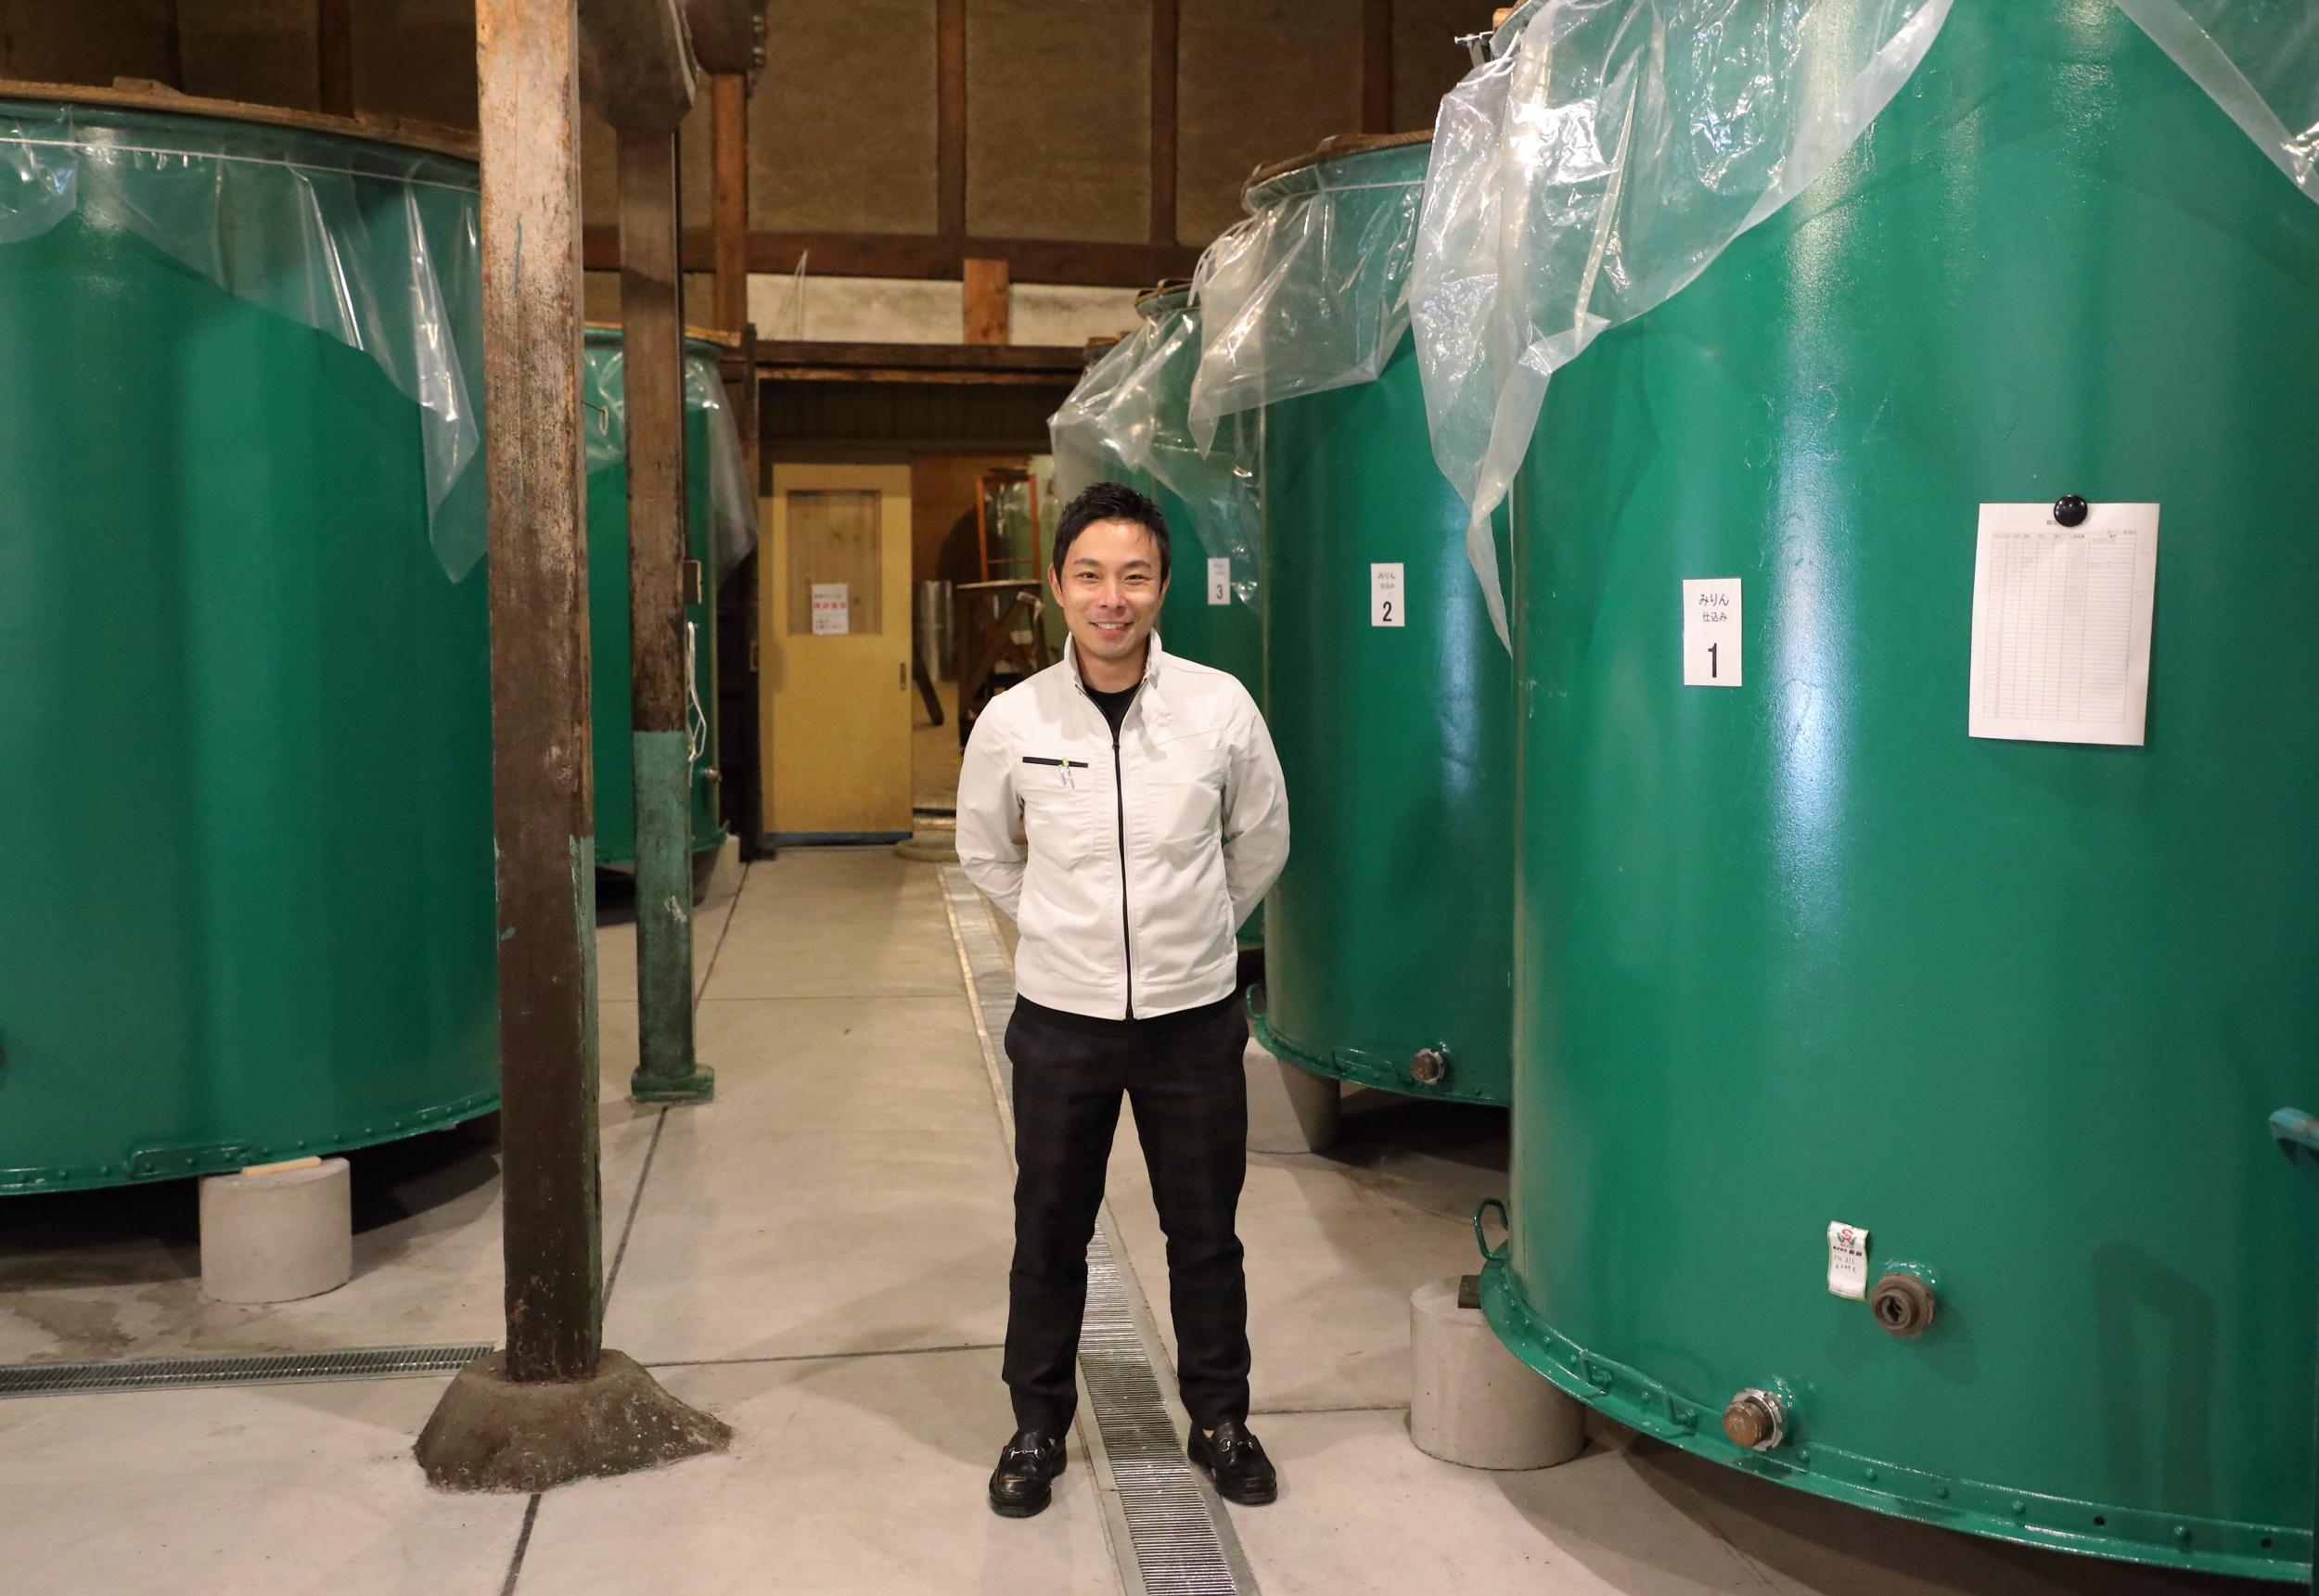 The fifth generation head of Hakusen Shuzo, Yuki Kato standing amidst the tanks used to ferment  hon-miri n.